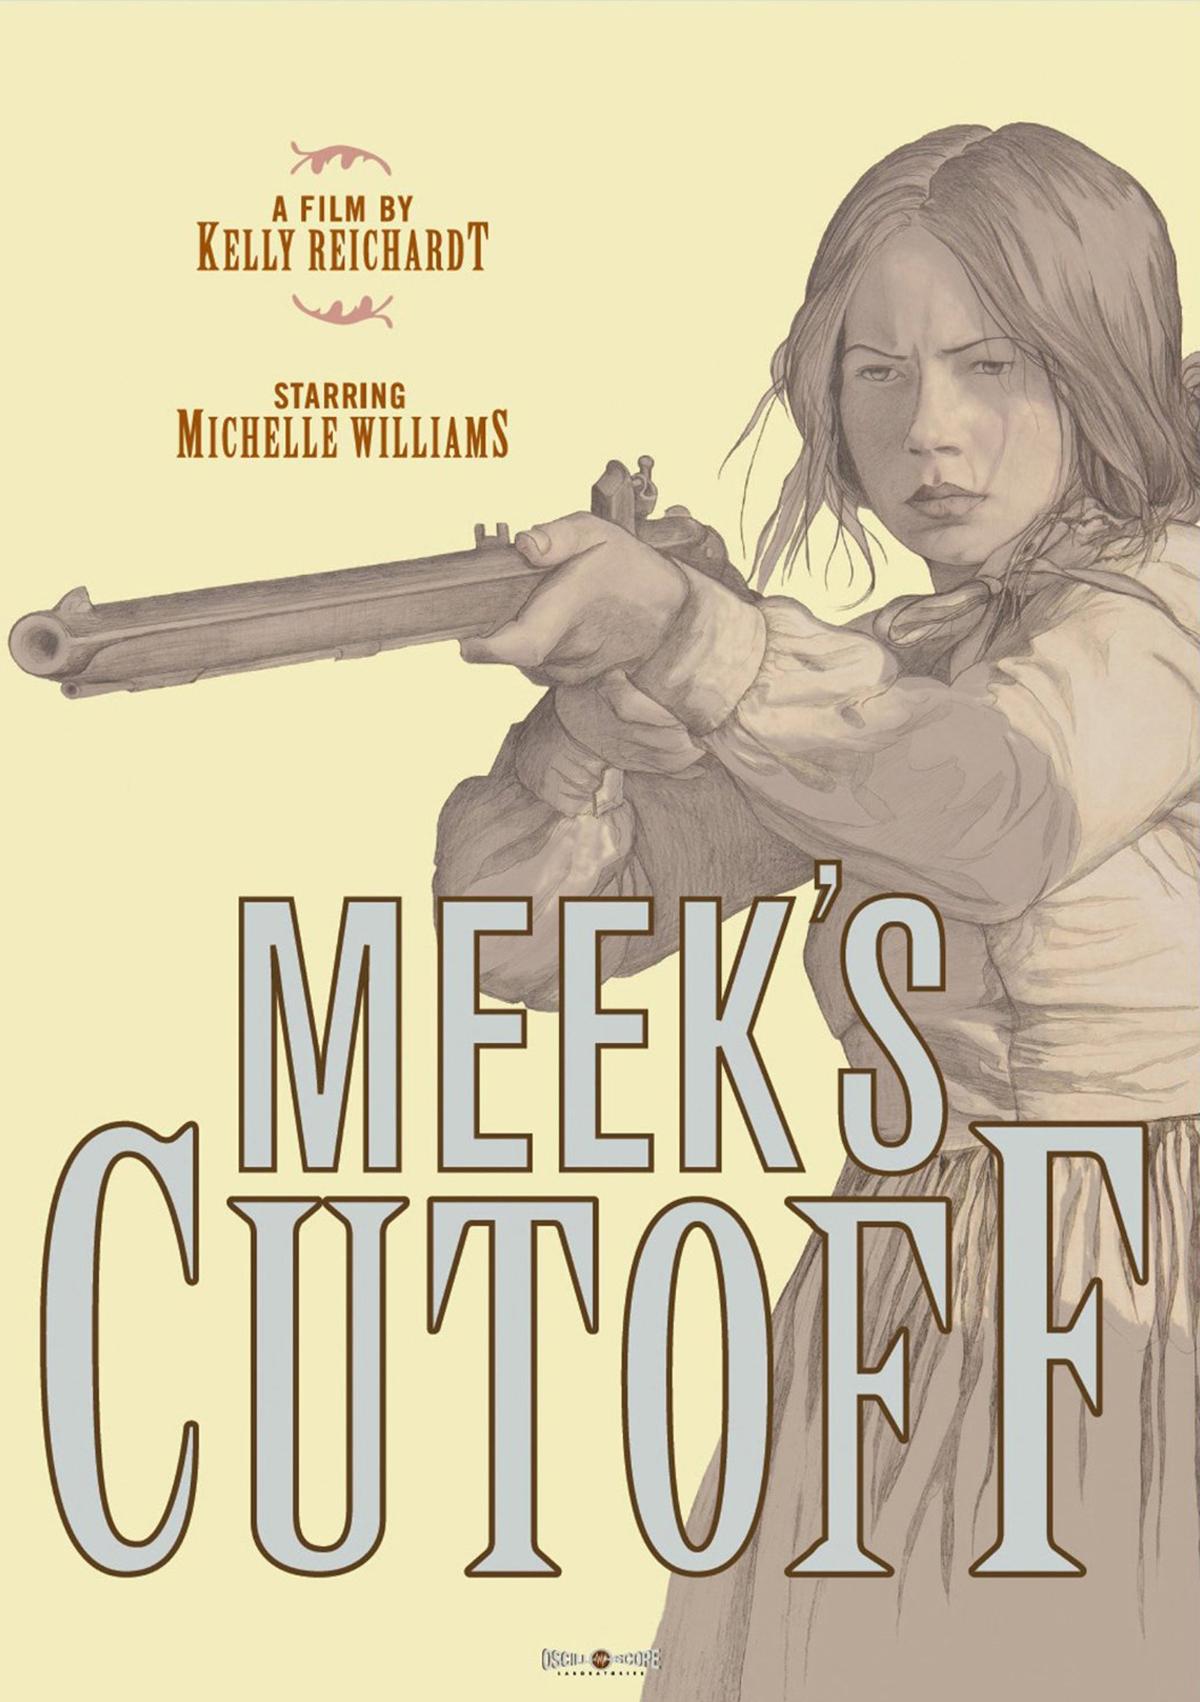 American Restoration Kelly Nude dvd review: meek's cutoff - slant magazine